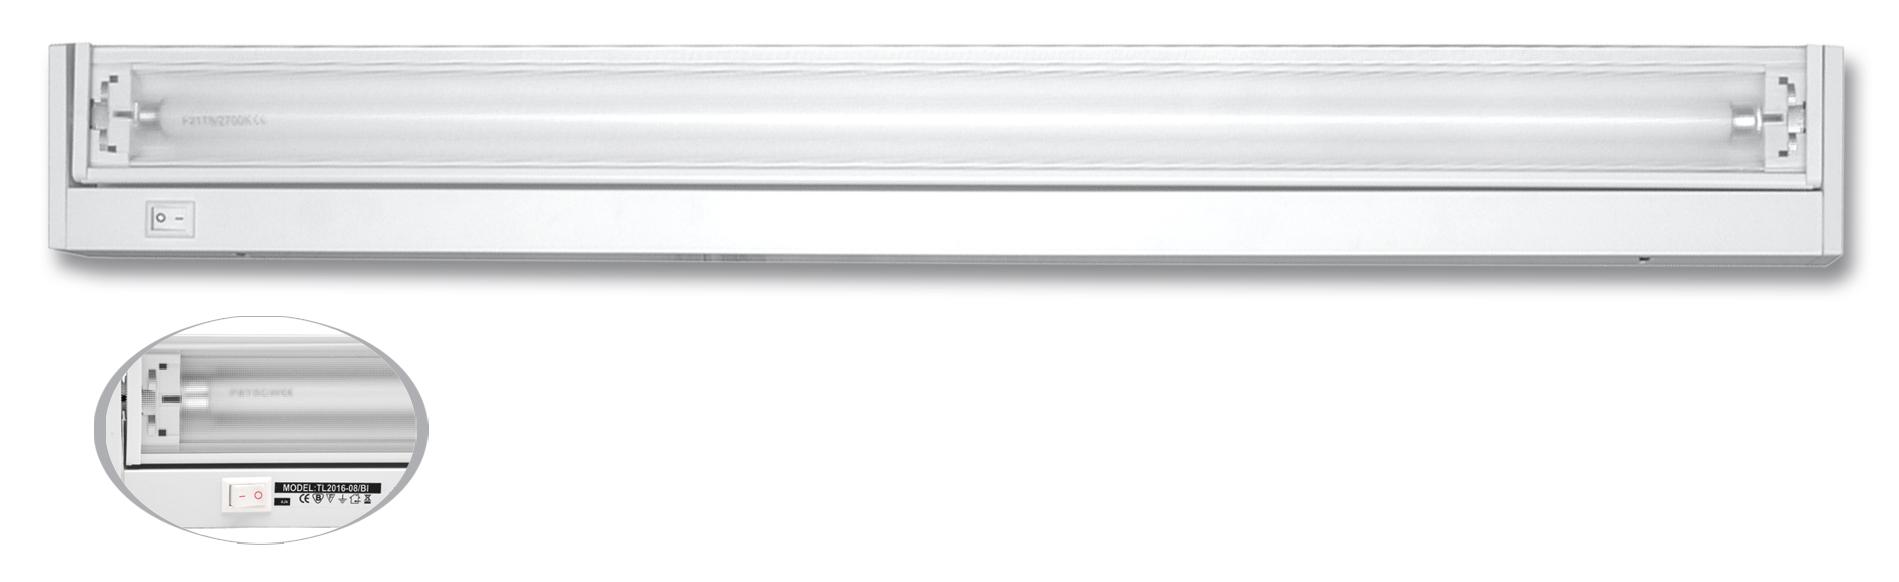 Ecolite TL2016-21/BI (Svietidlo žiarivkové 21W výklopné biele)